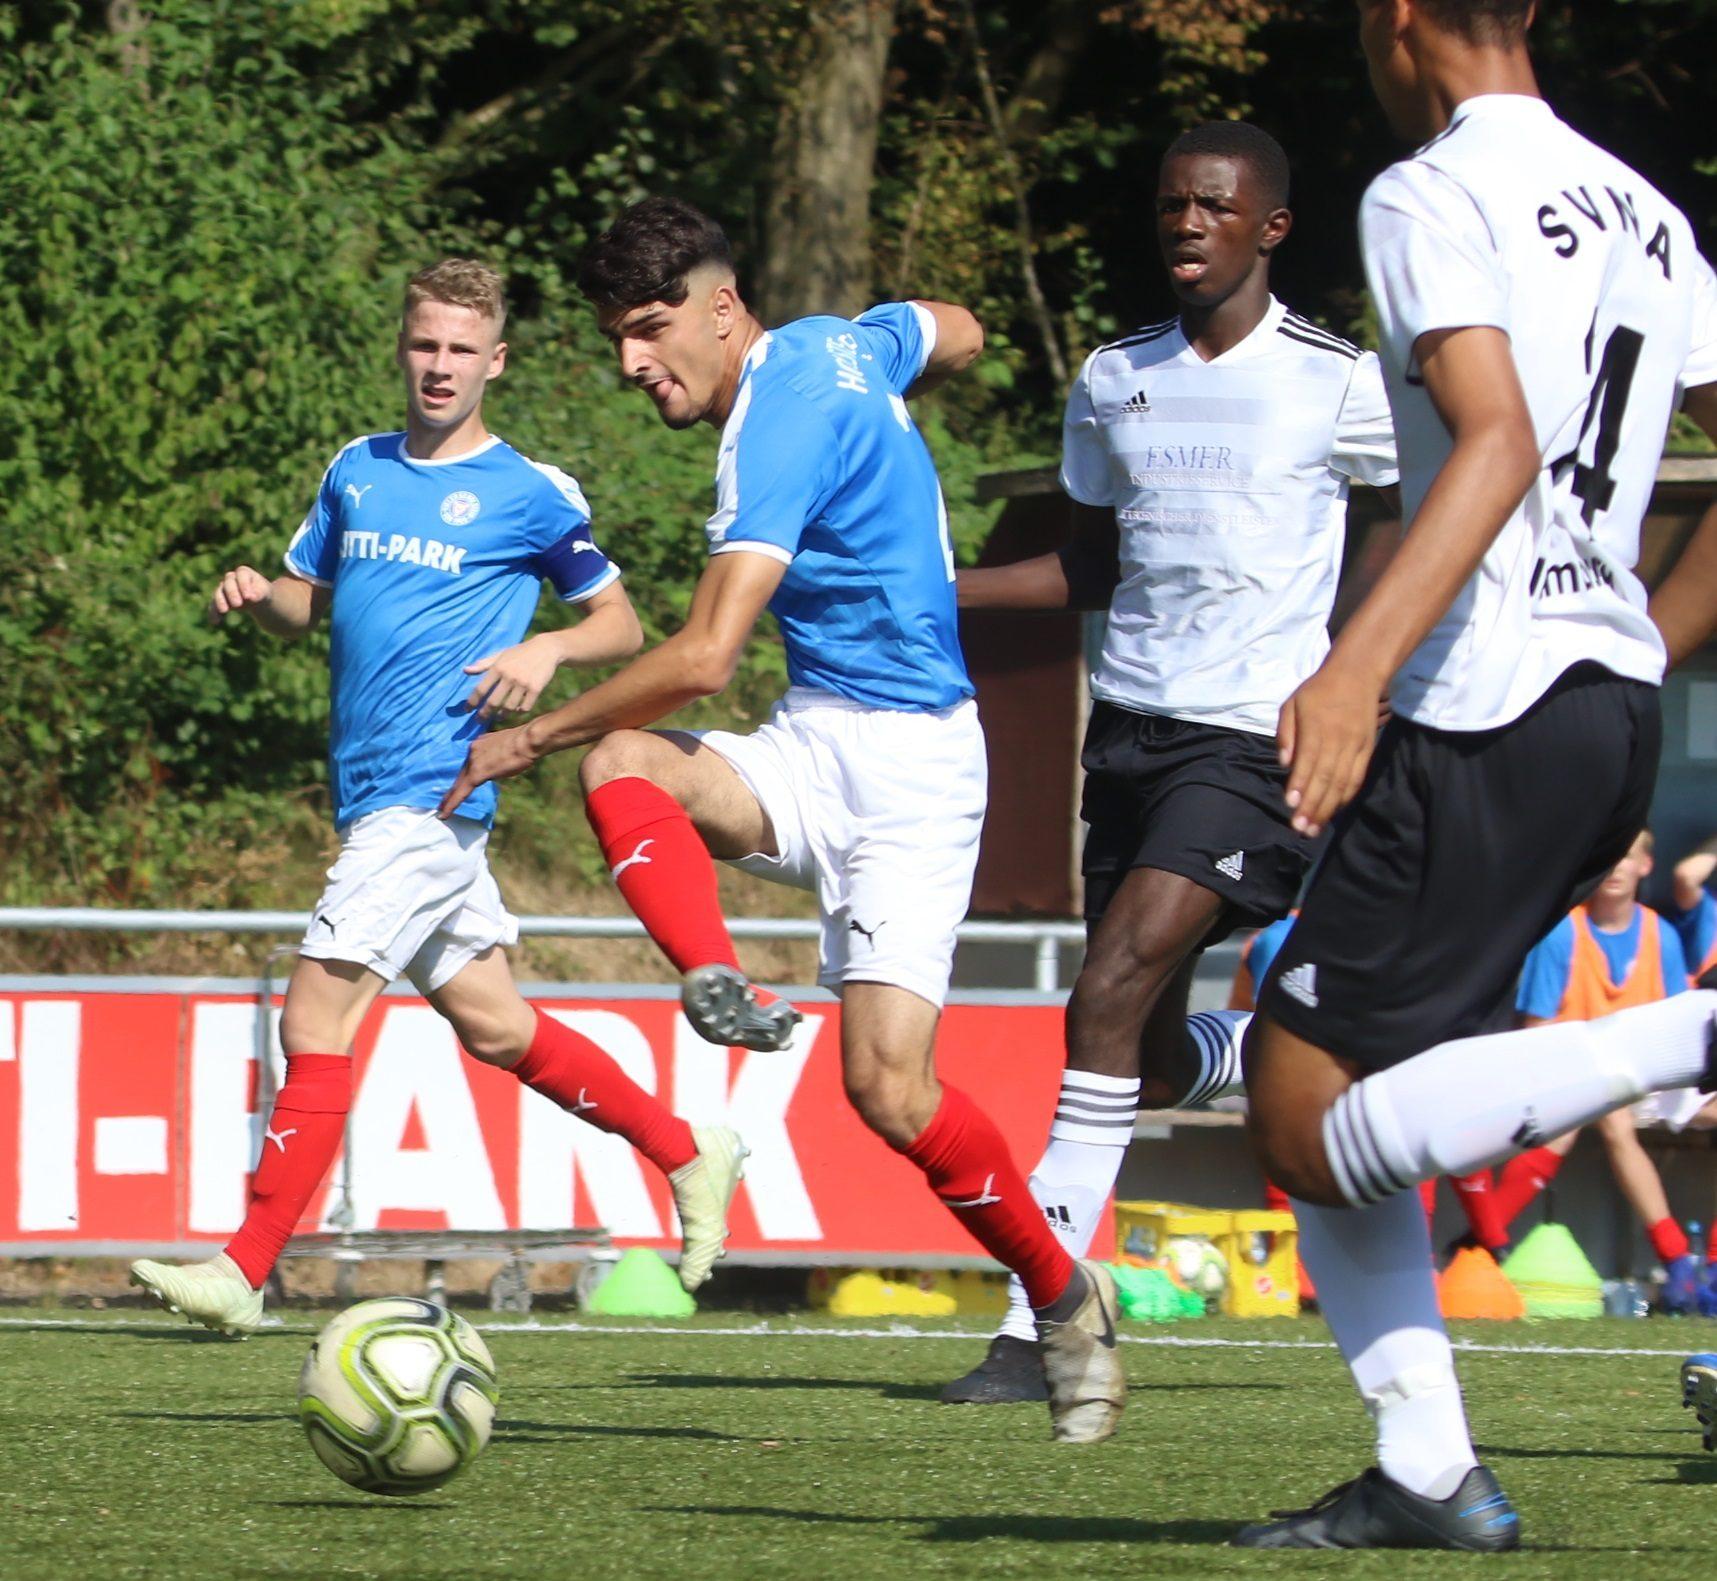 20190831 Der Kieler Sadjad Rezai zieht gegen Nettelnburg ab